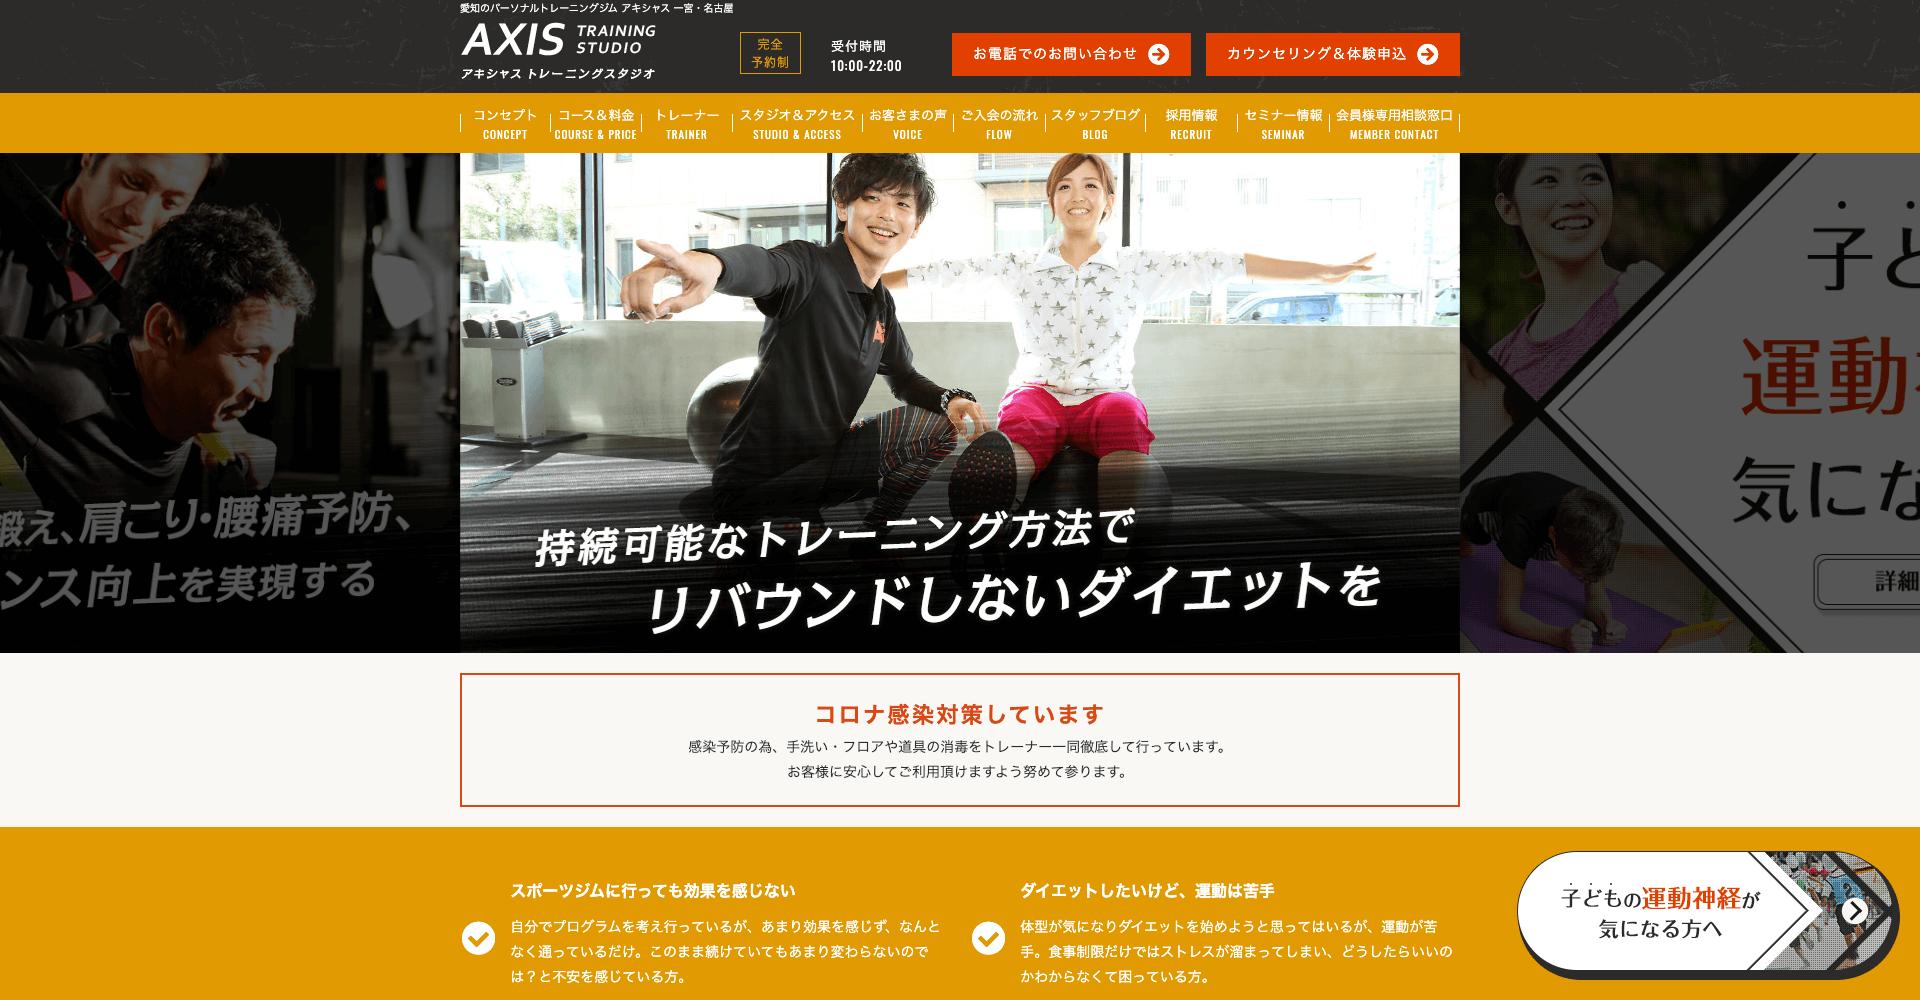 AXIS TRANING STUDIO 一宮店 パーソナルトレーニングジム